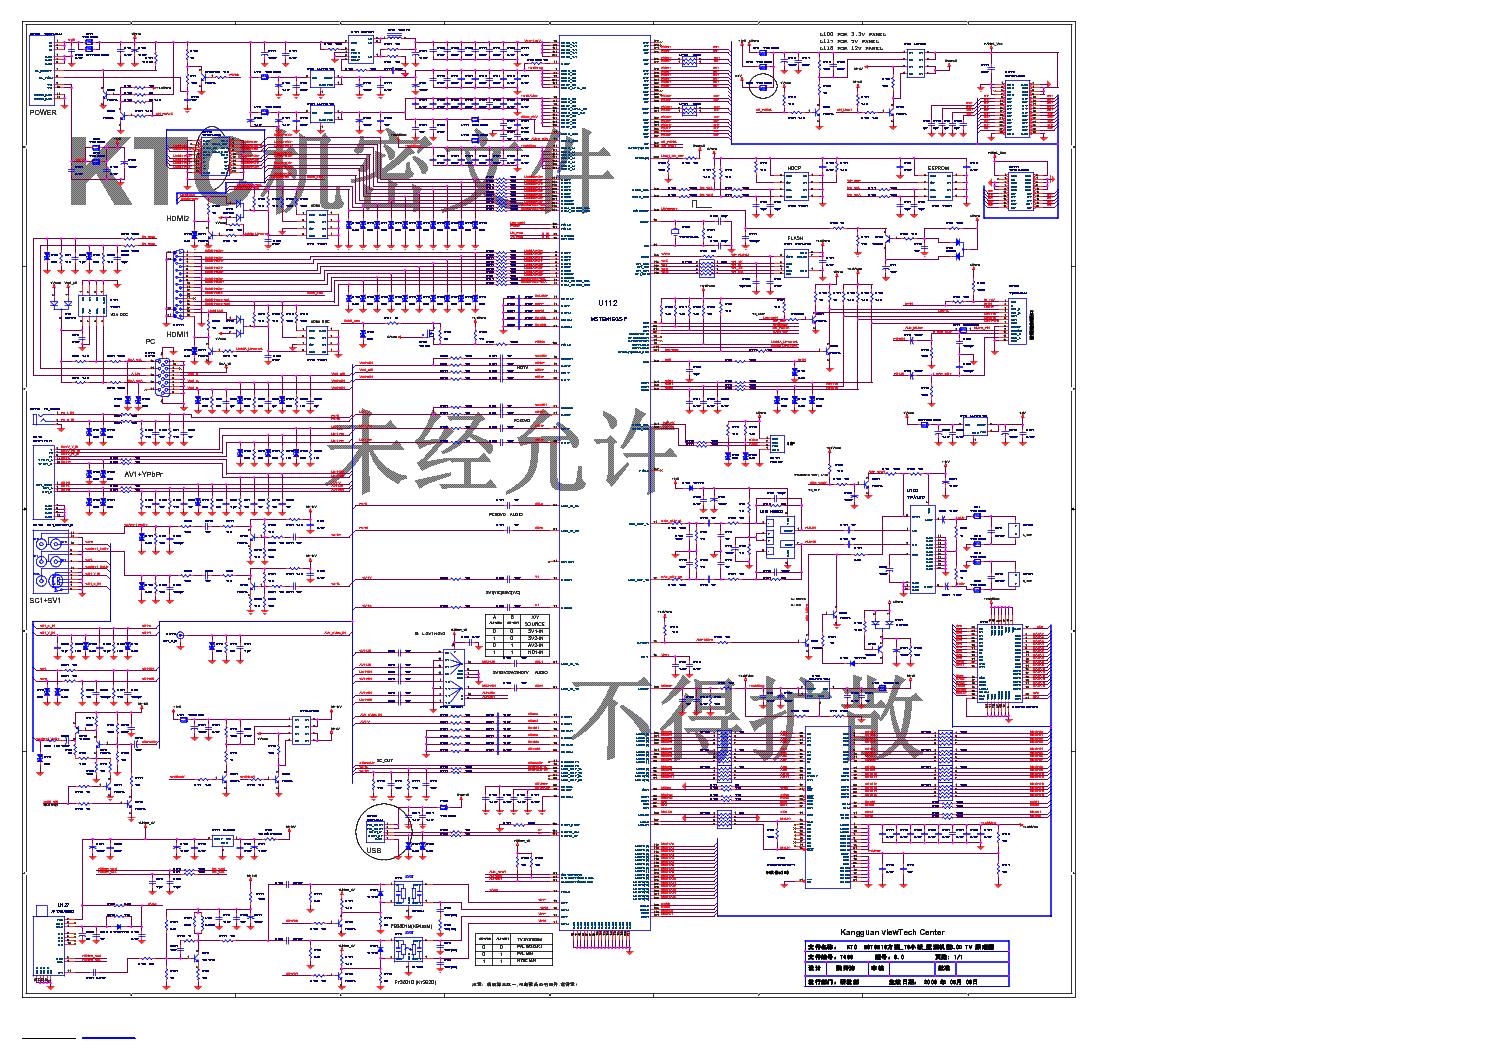 wholesale mst6m16 sch service manual download schematics eeprom rh elektrotanya com Service ManualsOnline Auto Repair Manual